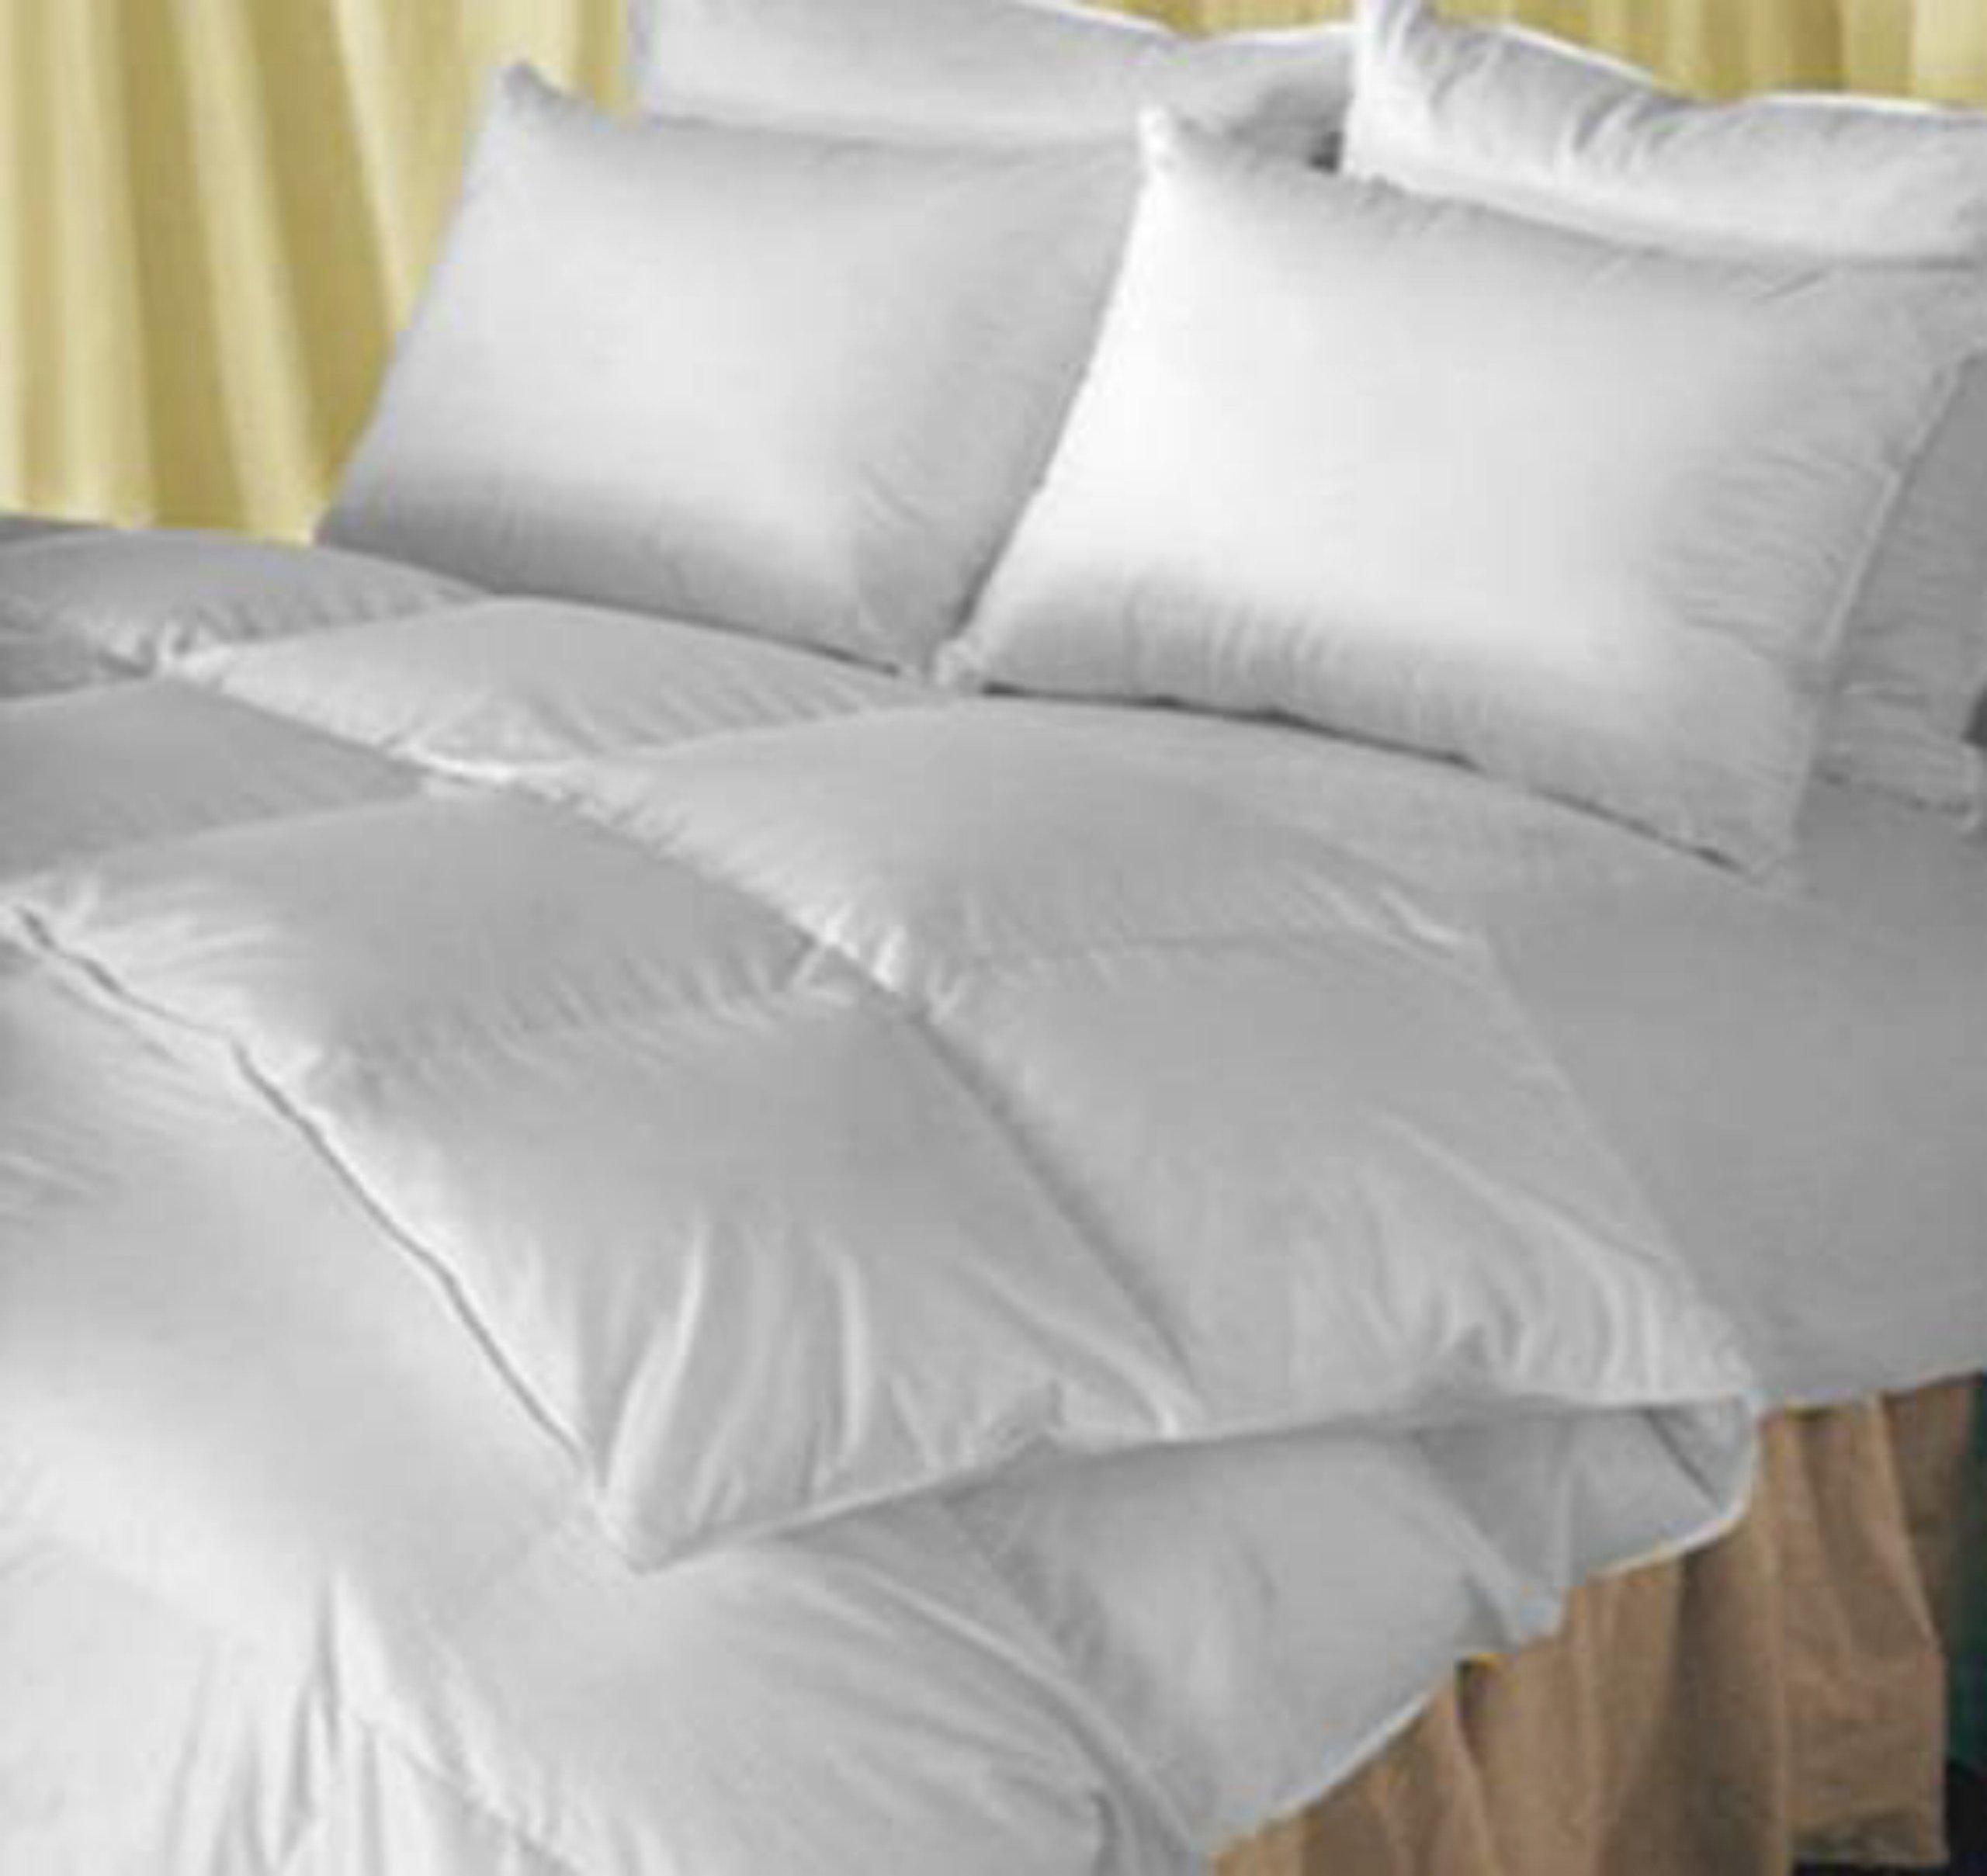 Natural Comfort Classic Heavy Fill White Goose Down Alternative Duvet Insert Comforter, Queen/Queen XL 89''x95''